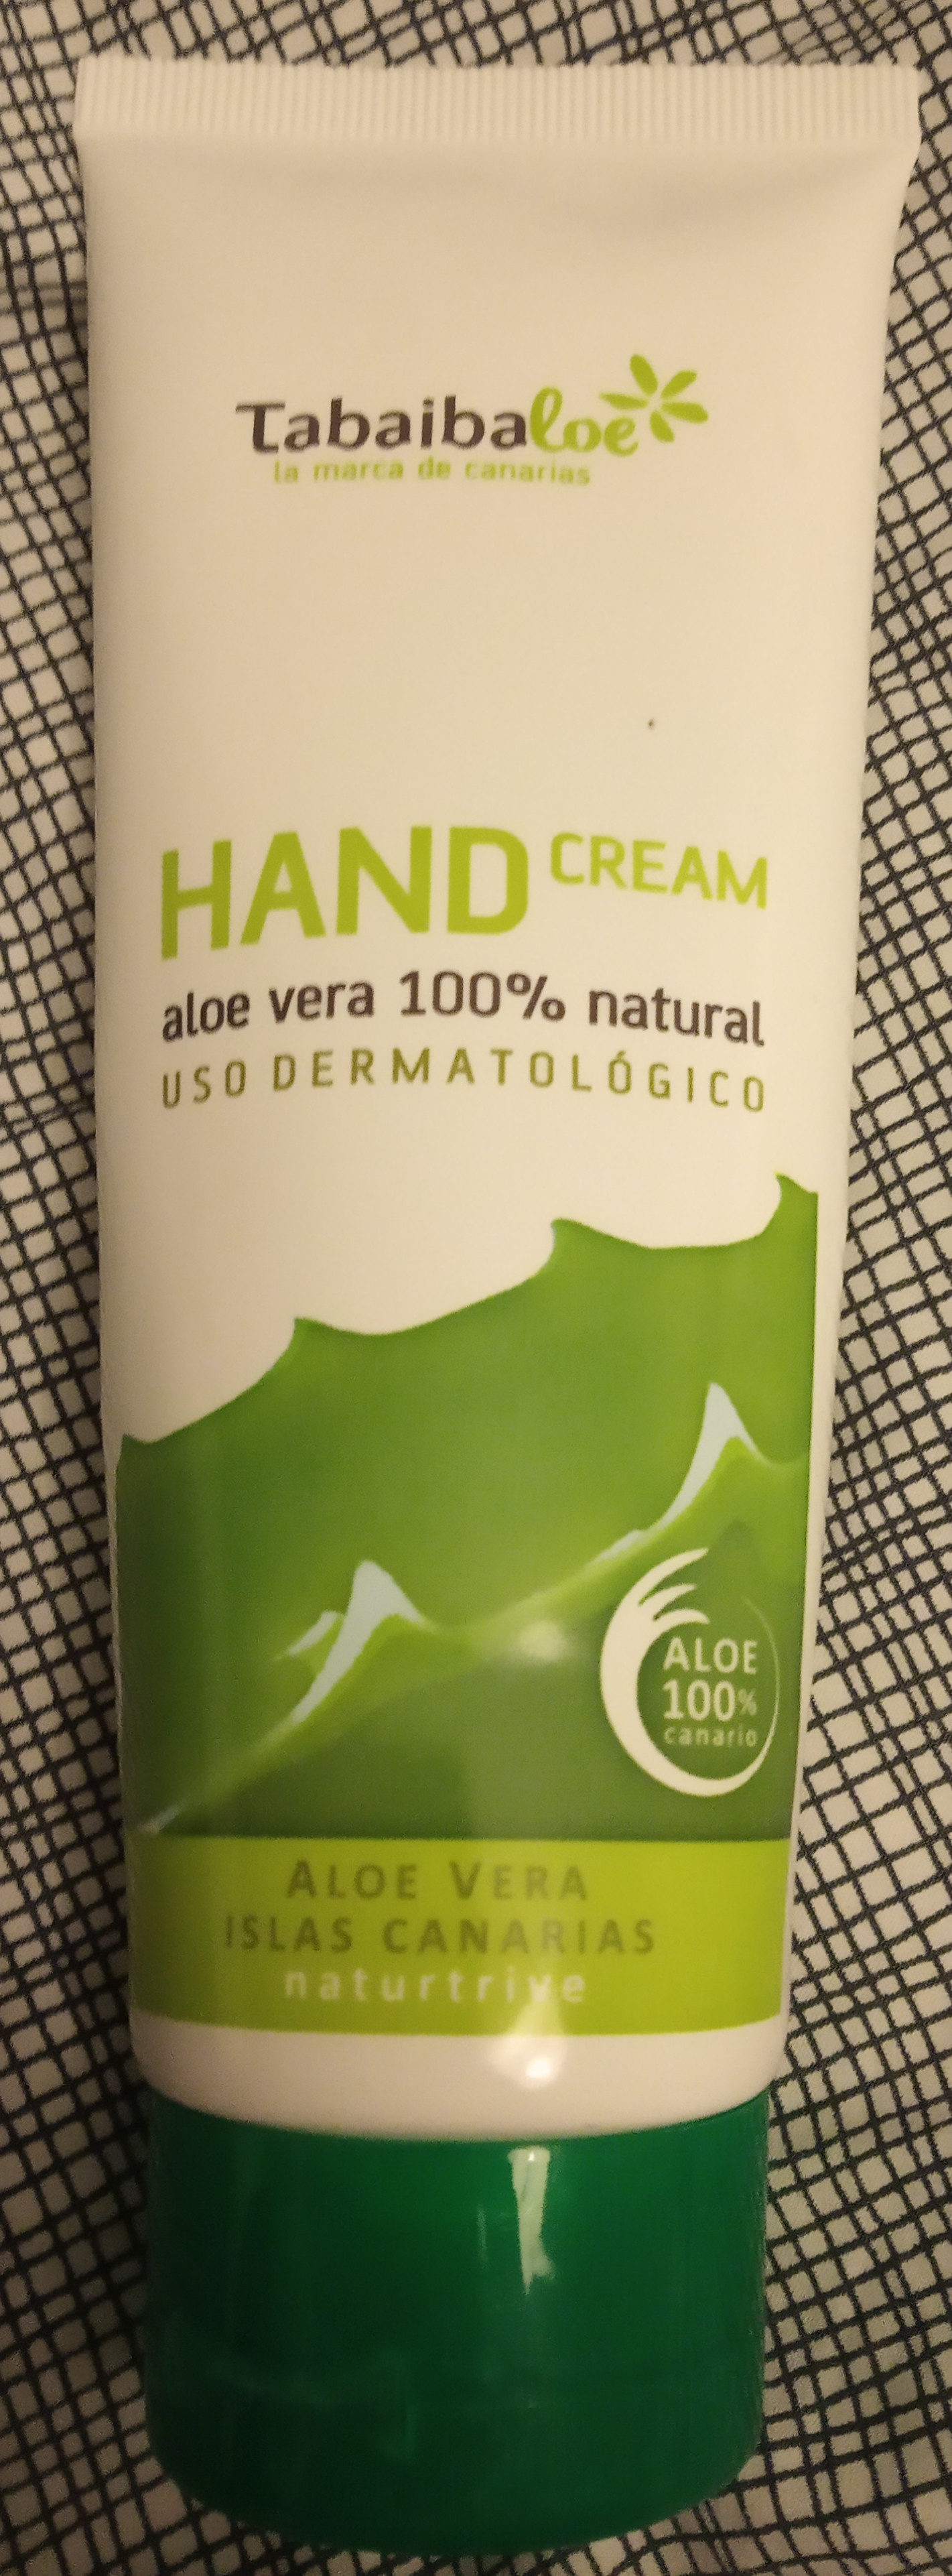 Tabaibaloe Handcream - Product